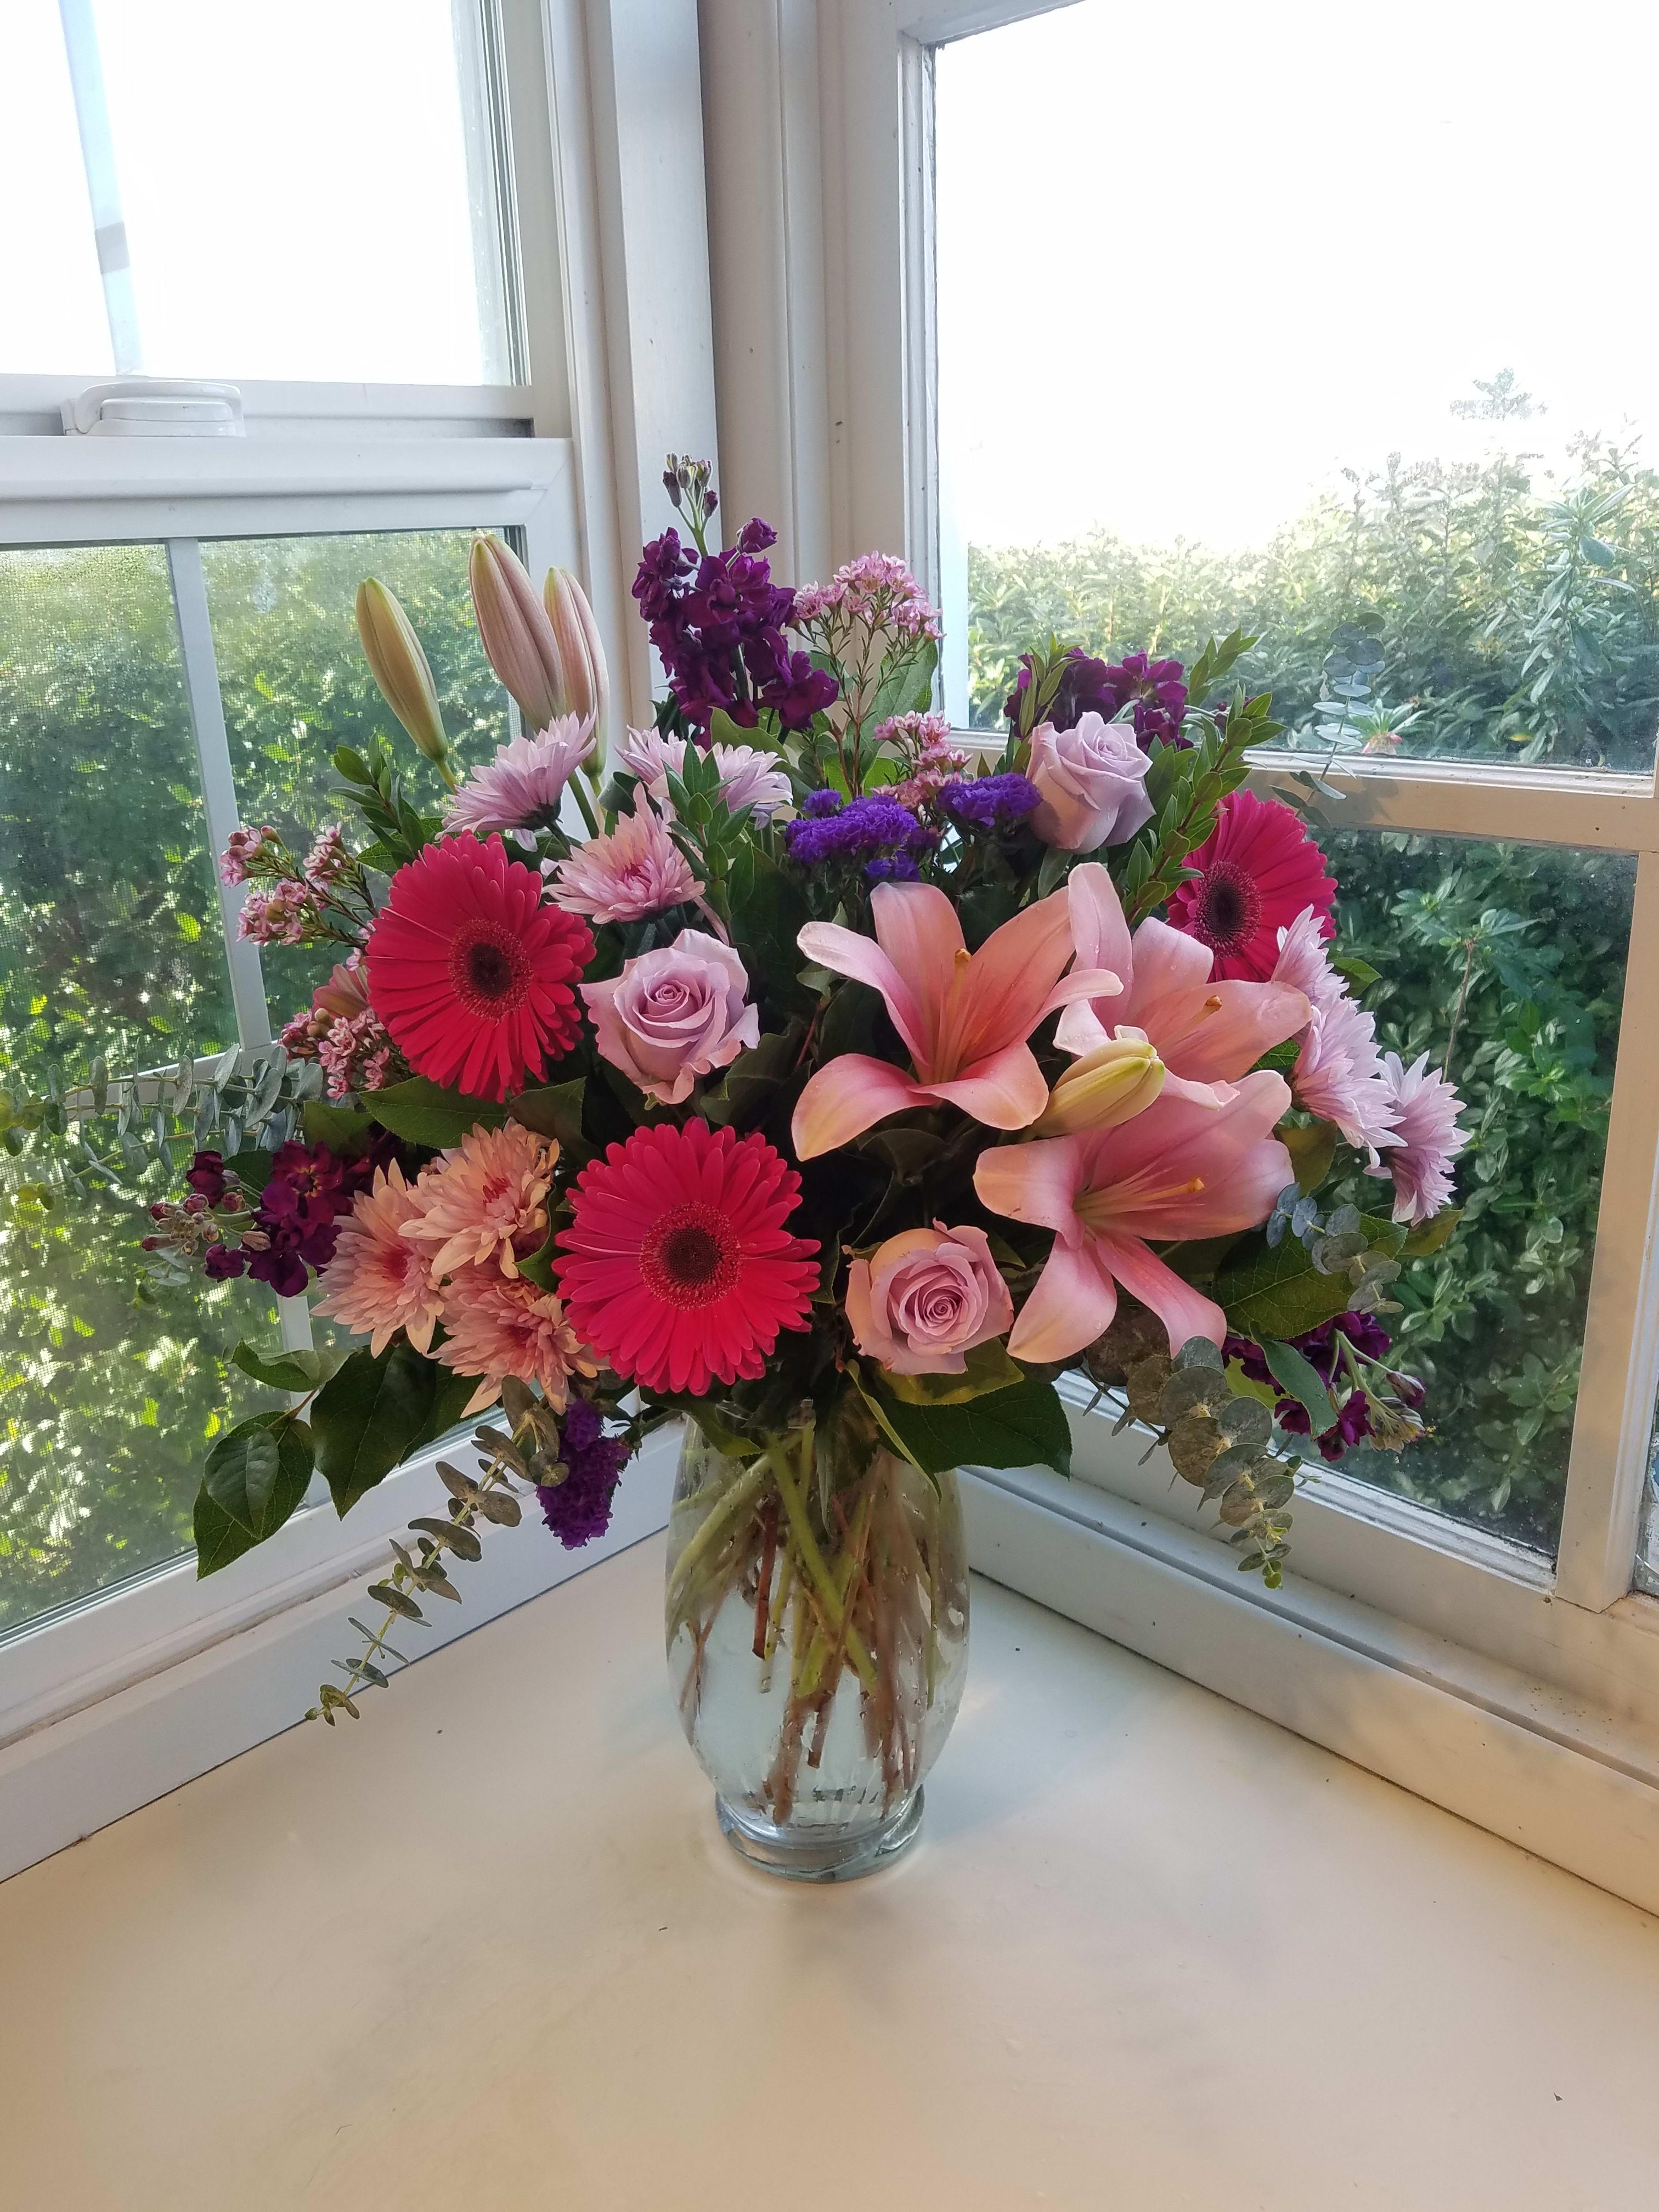 Raspberry Beret floral tiara Silk daisies geraldton wax and more! raspberries